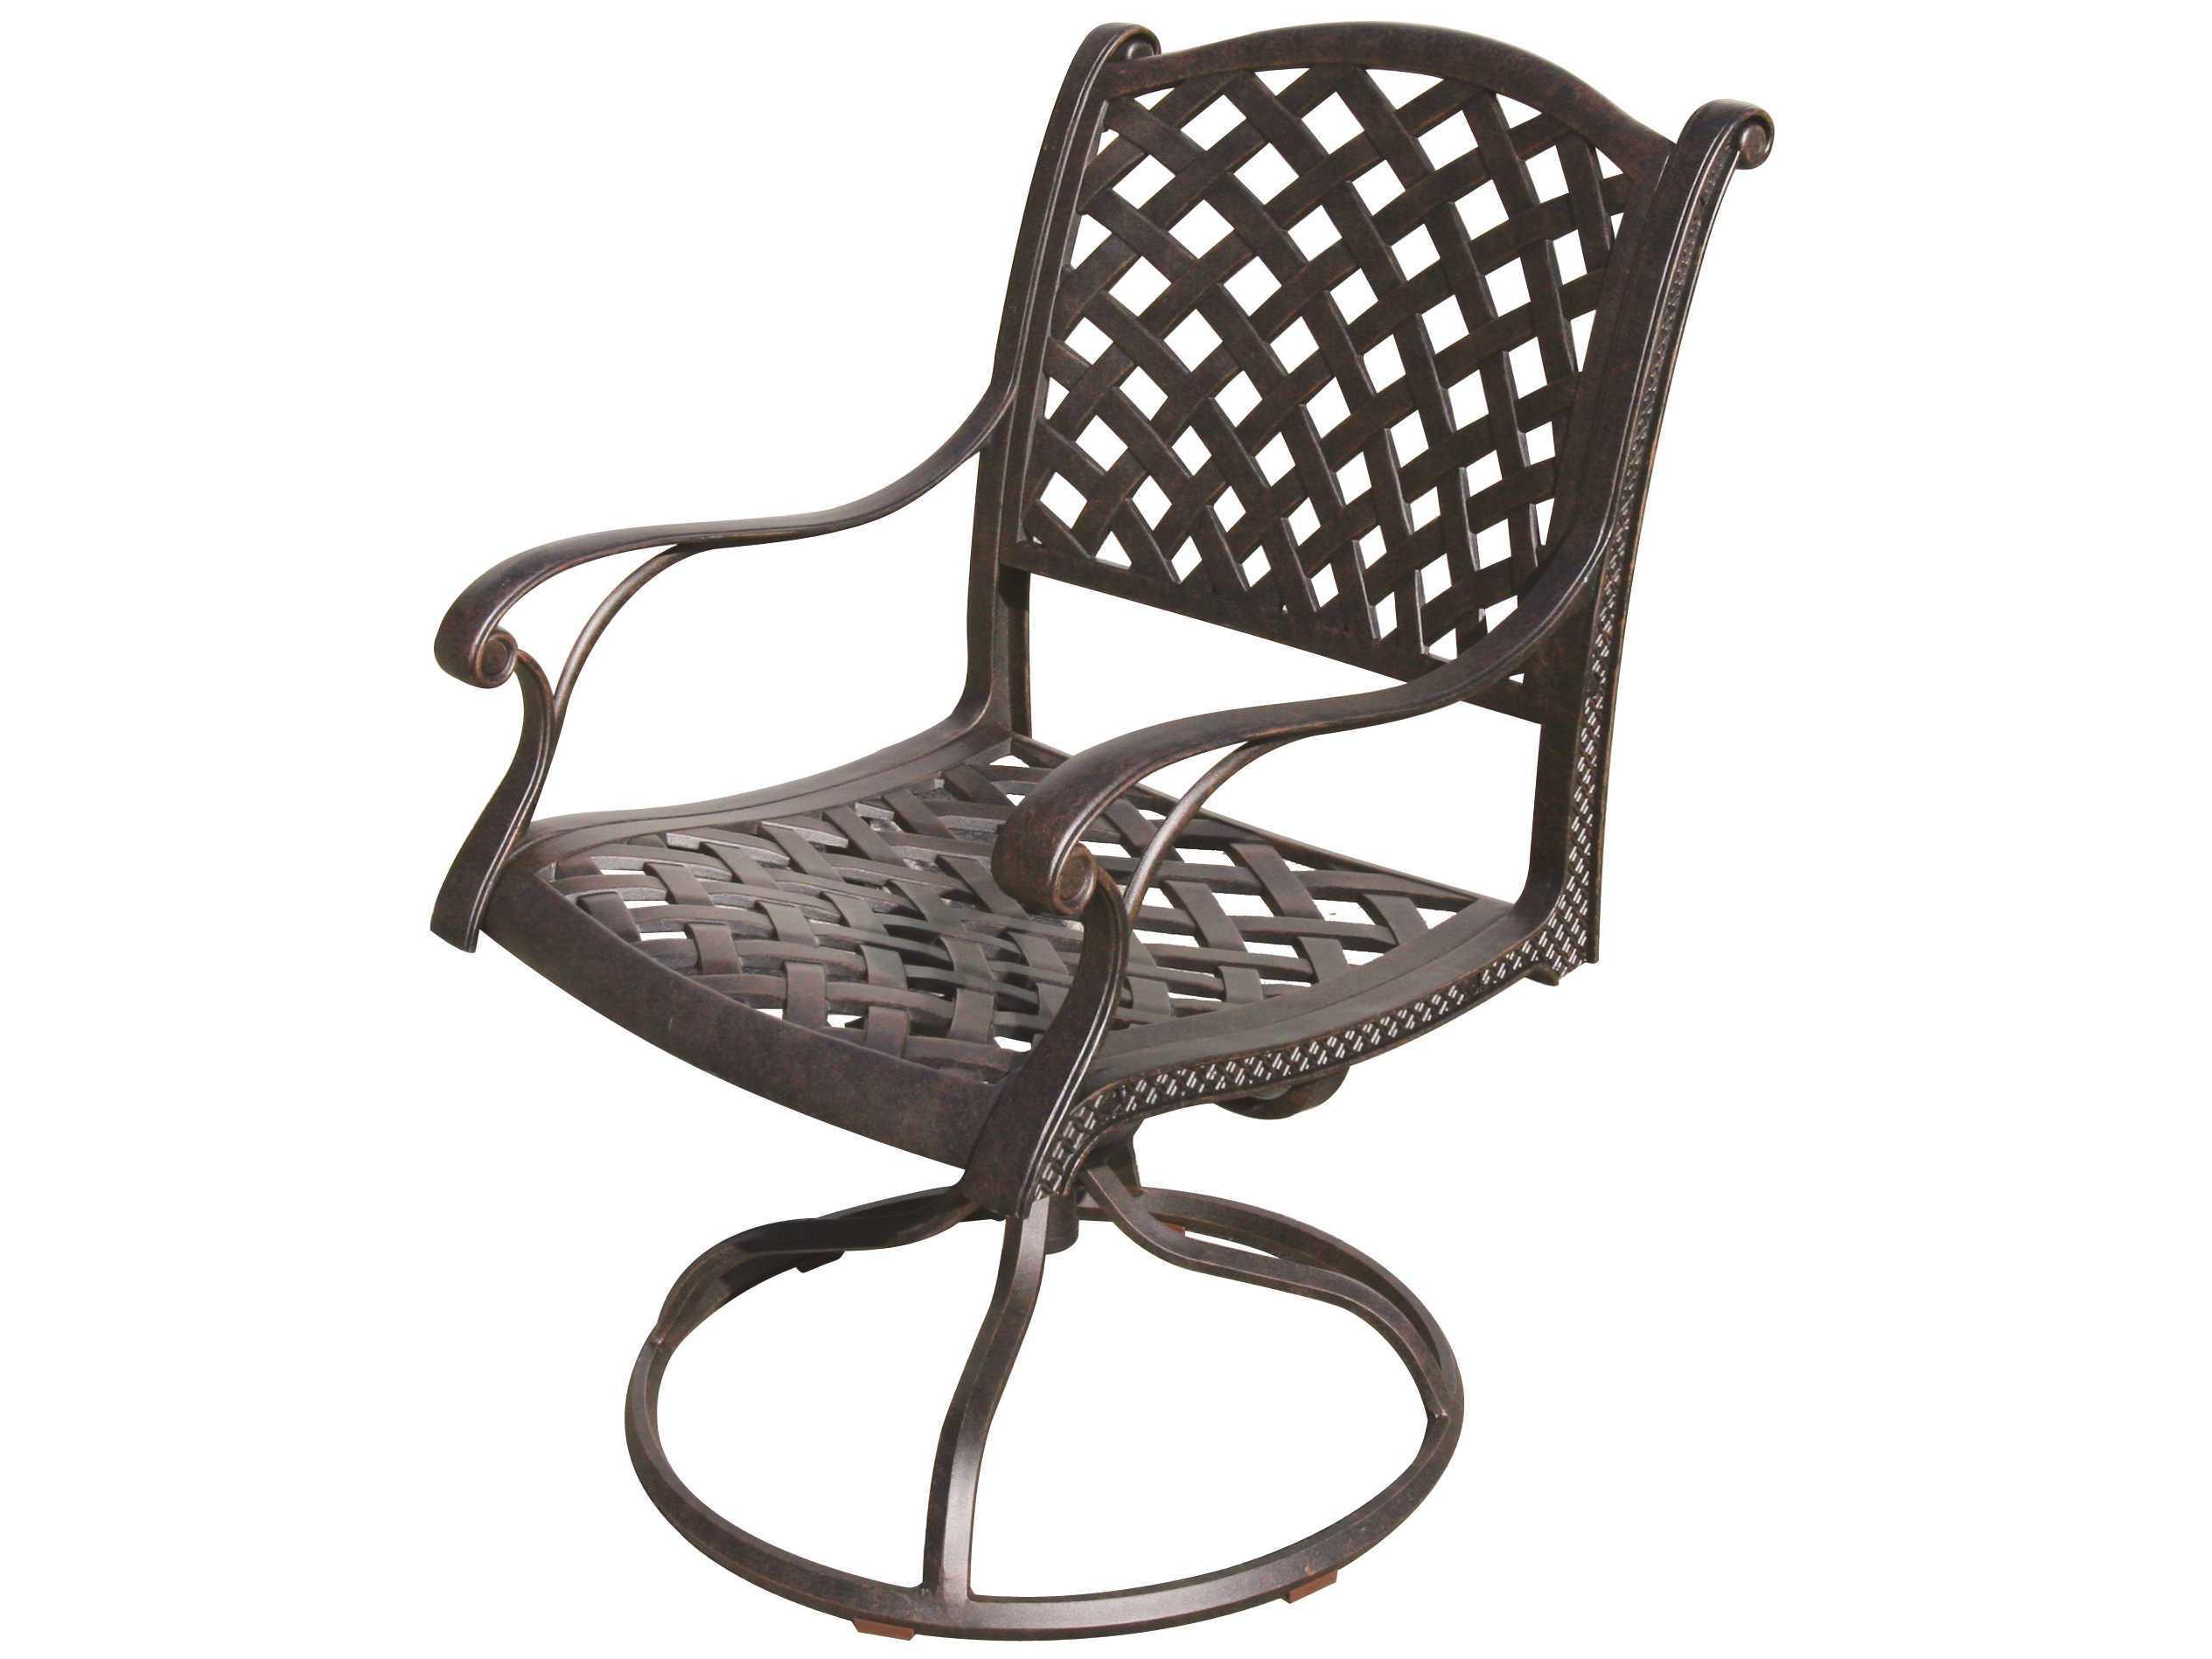 darlee outdoor living nassau cast aluminum antique bronze swivel rocker chair